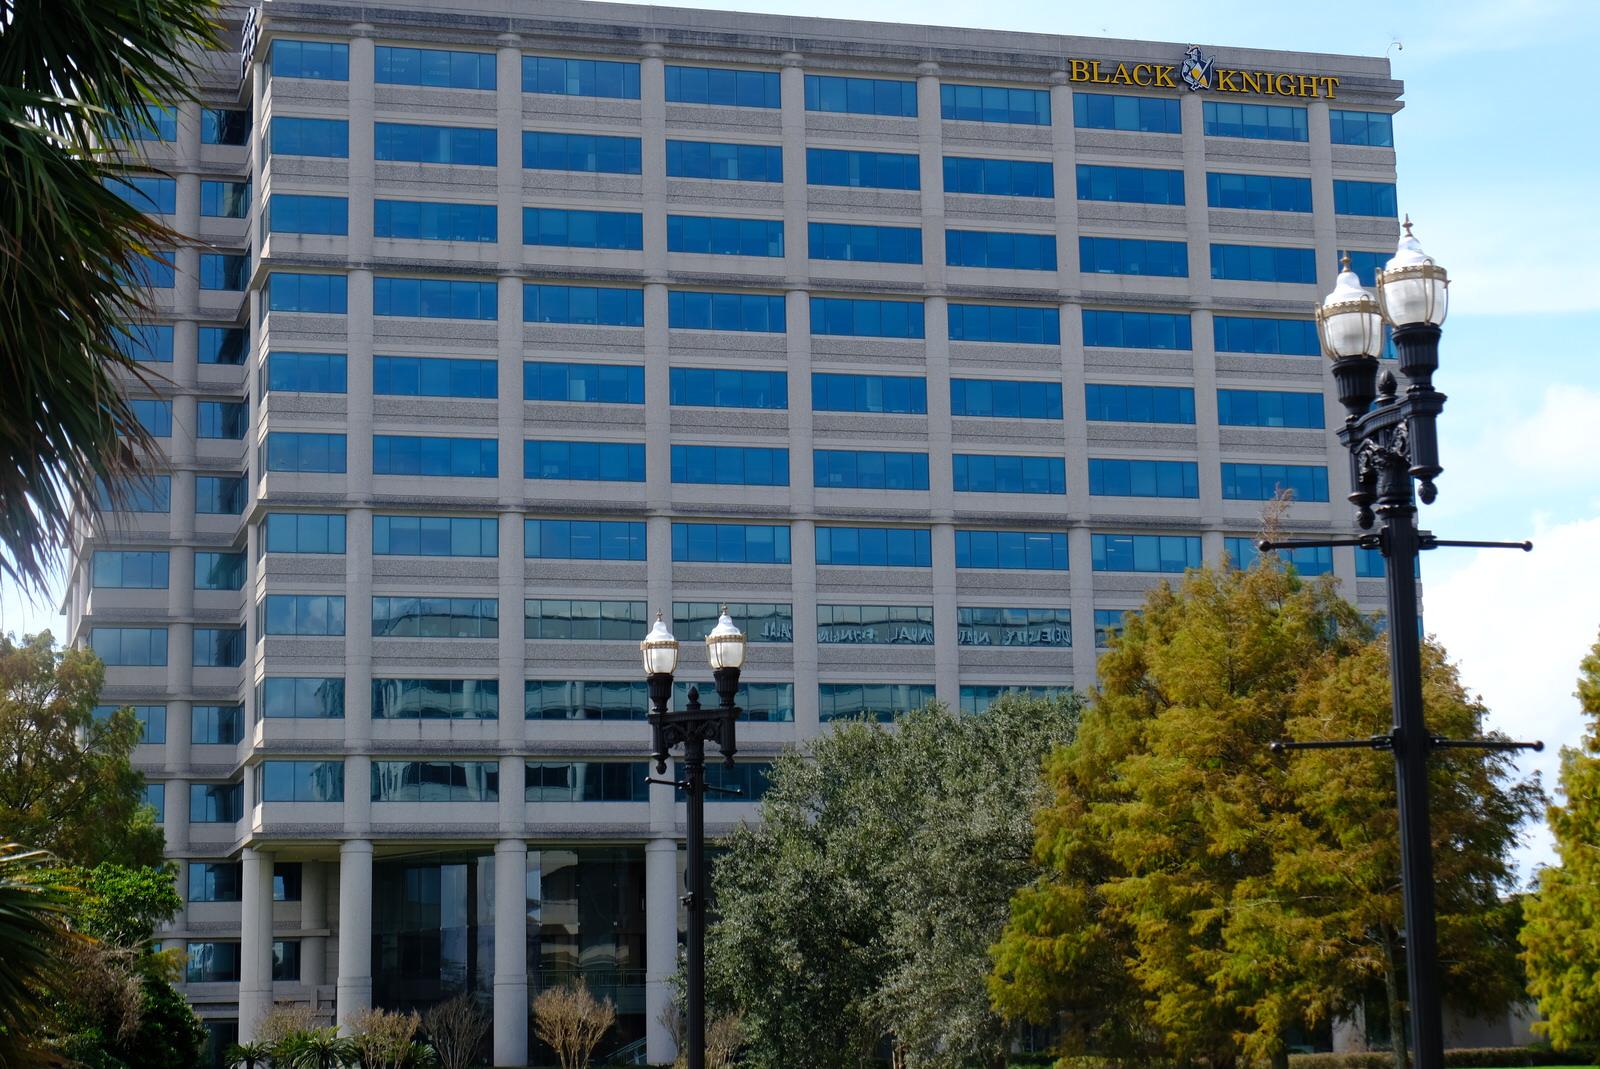 Black Knight's corporate headquarters in Jacksonville, Florida.